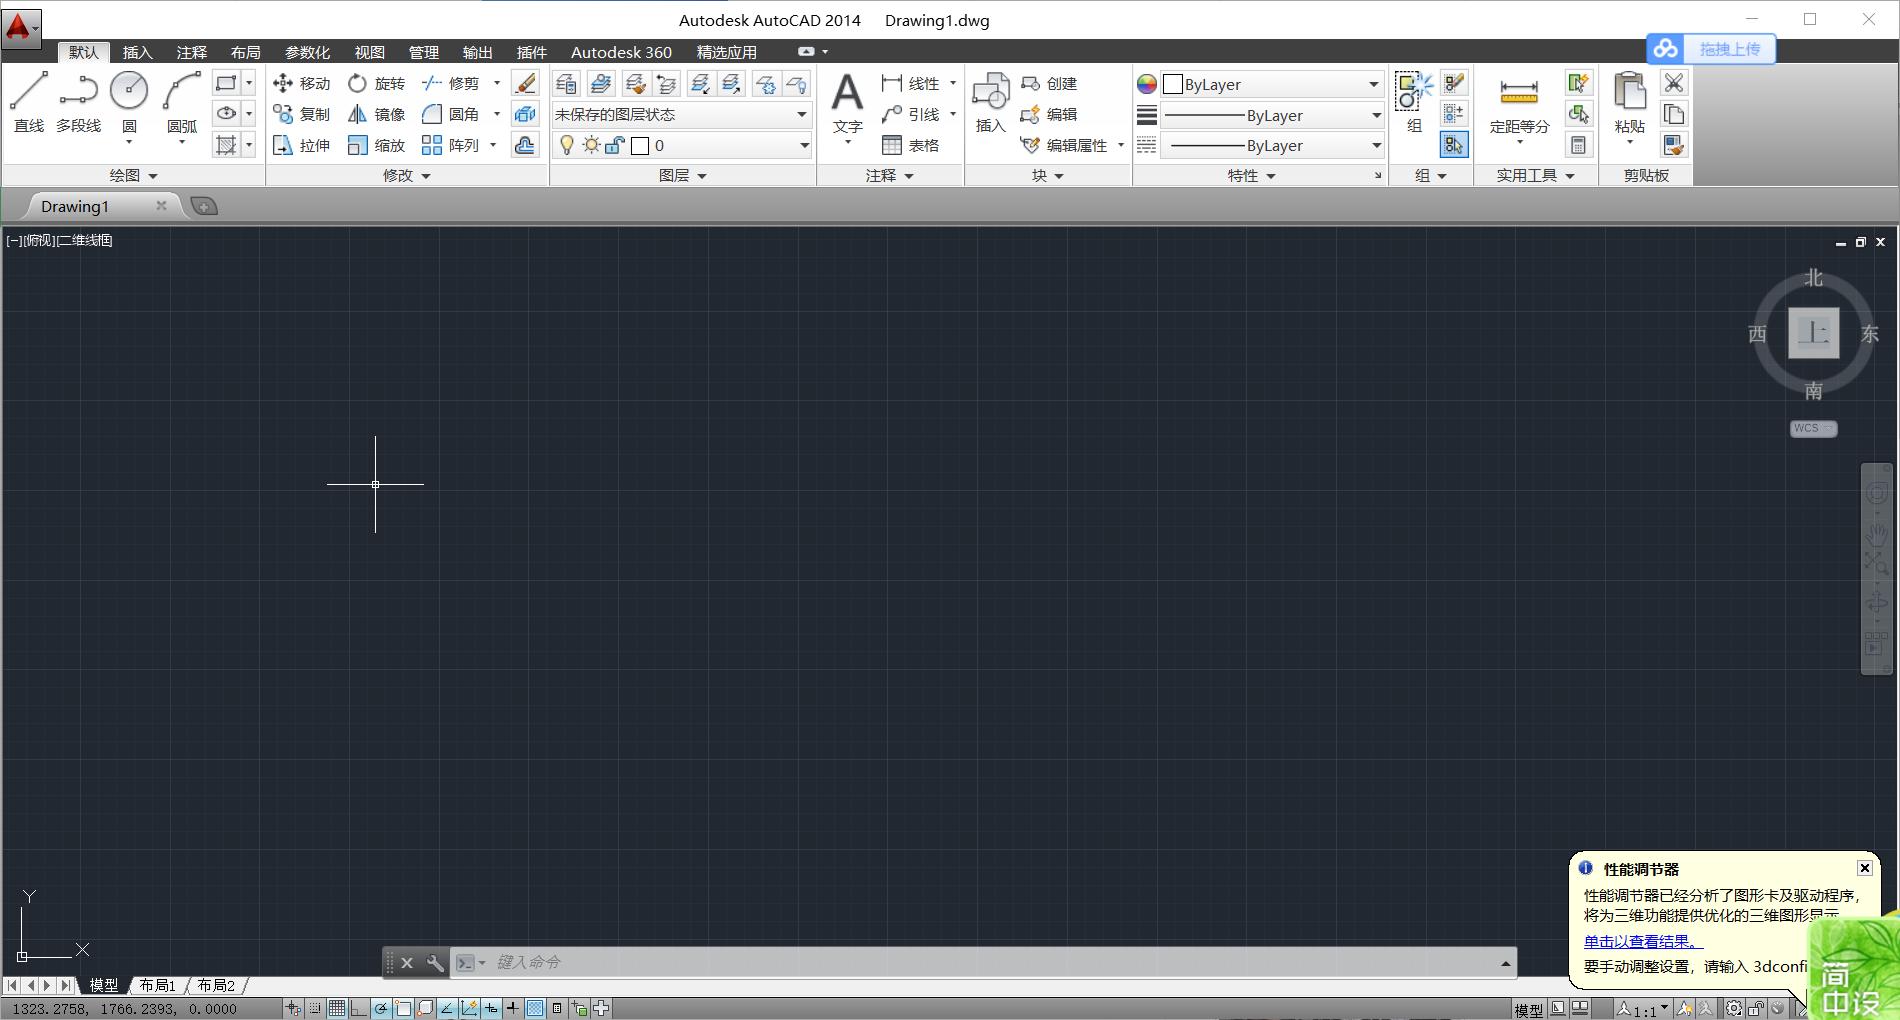 CAD2014打开后换成没画面直接进入这个激活cad安装怎么dfx图片